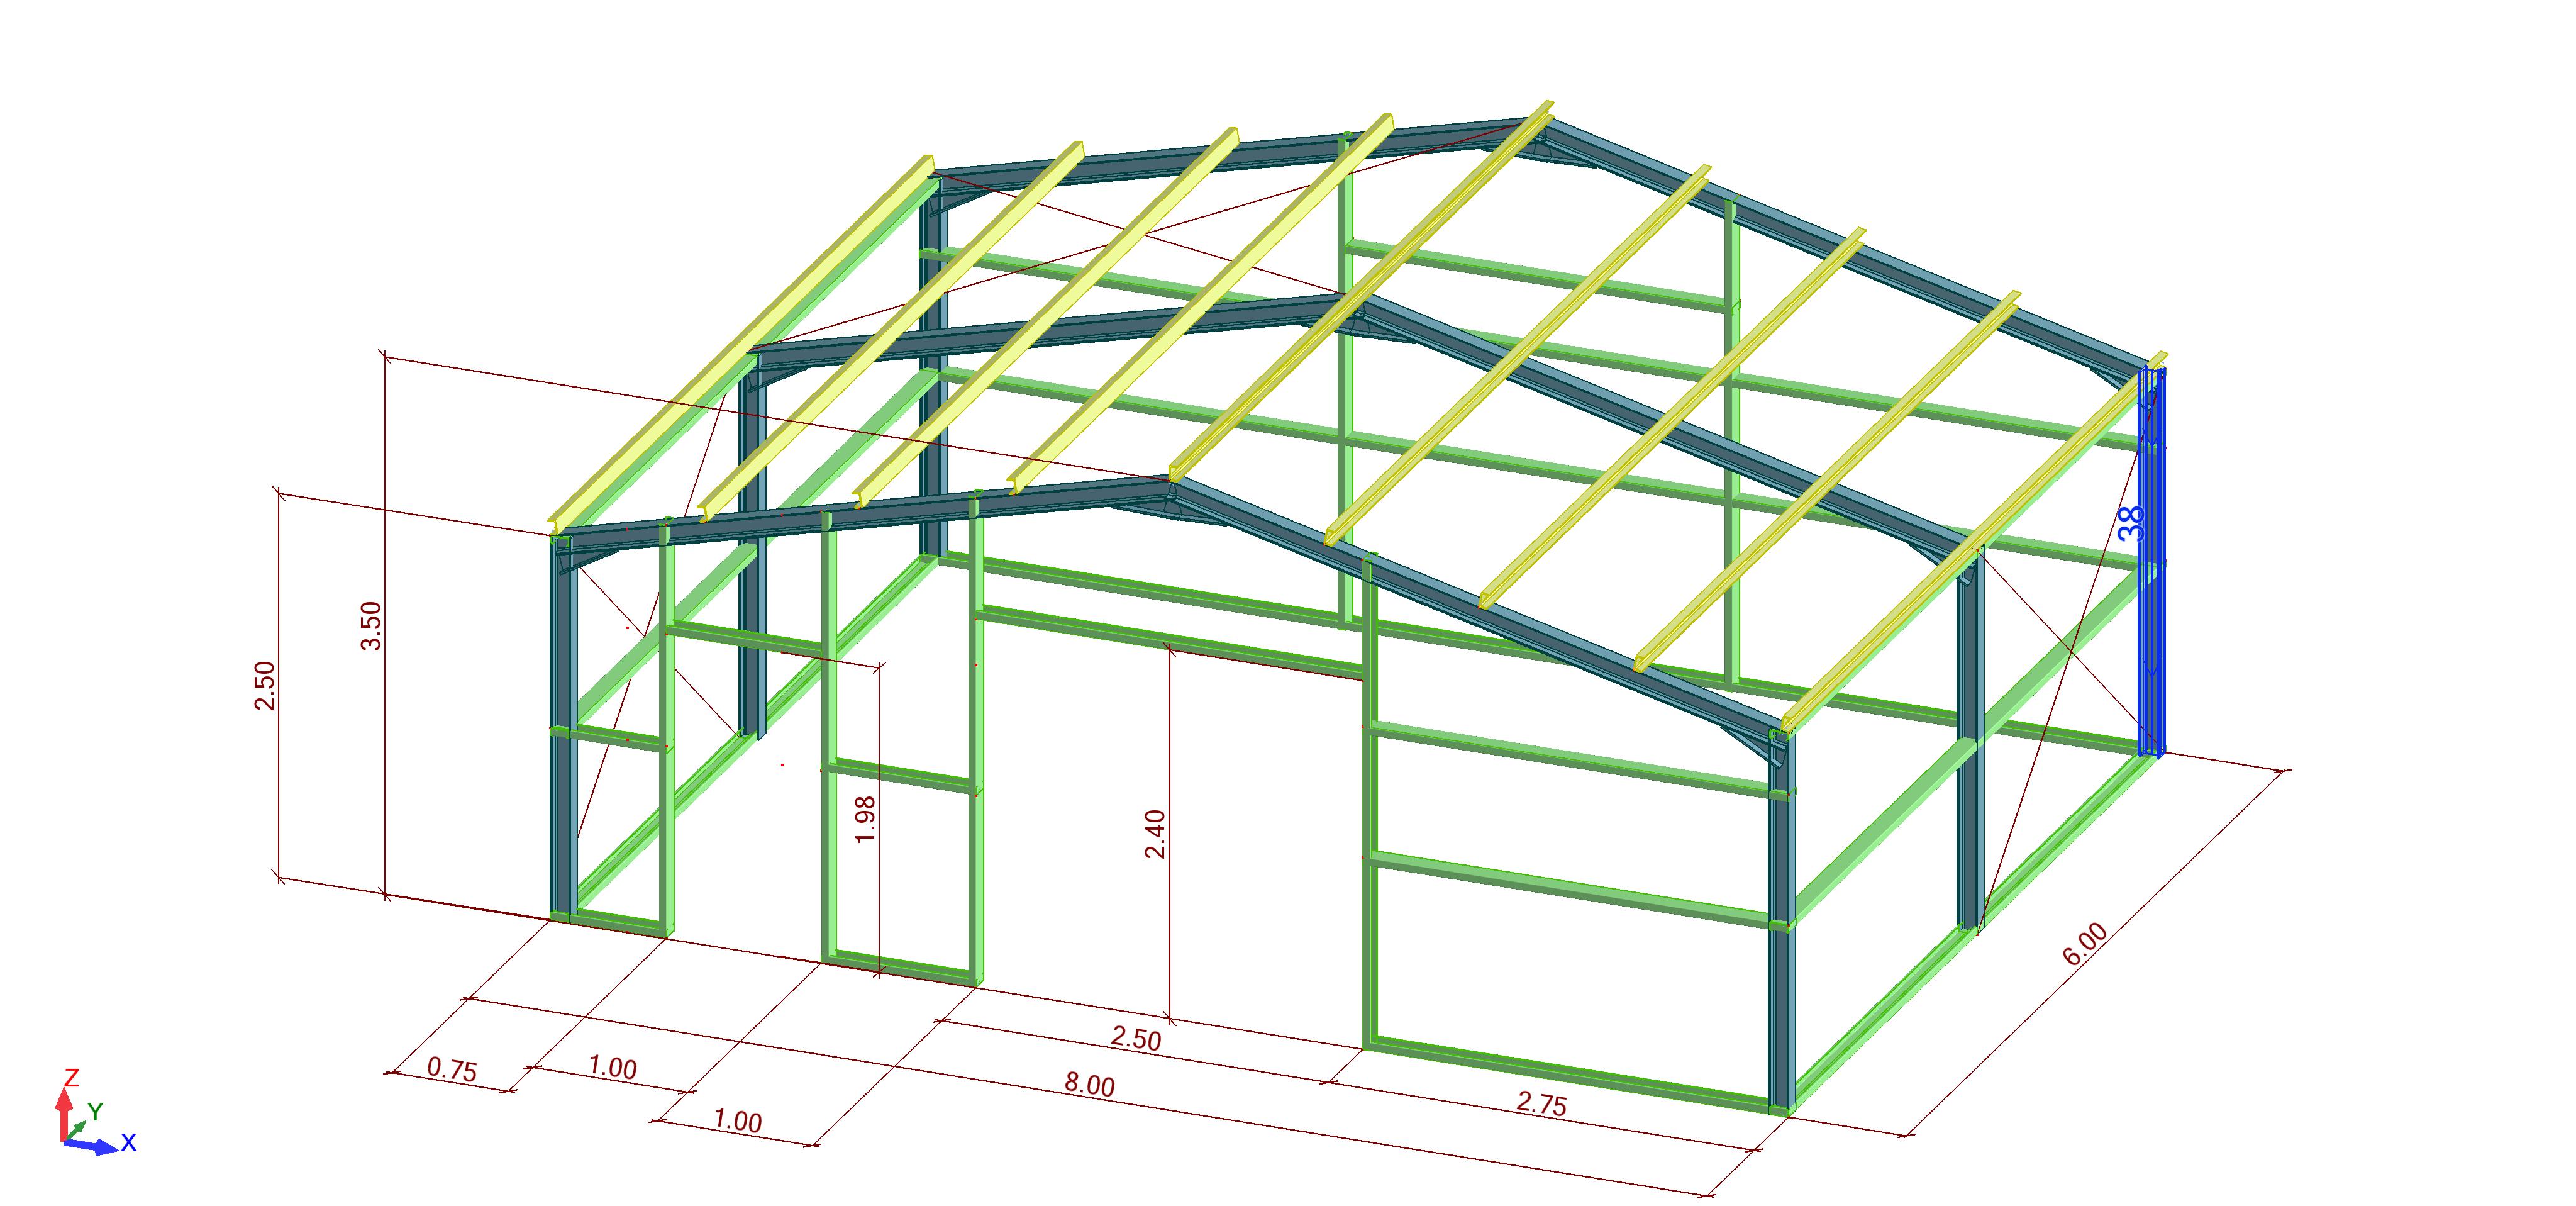 6m x 8m steel garage drawing